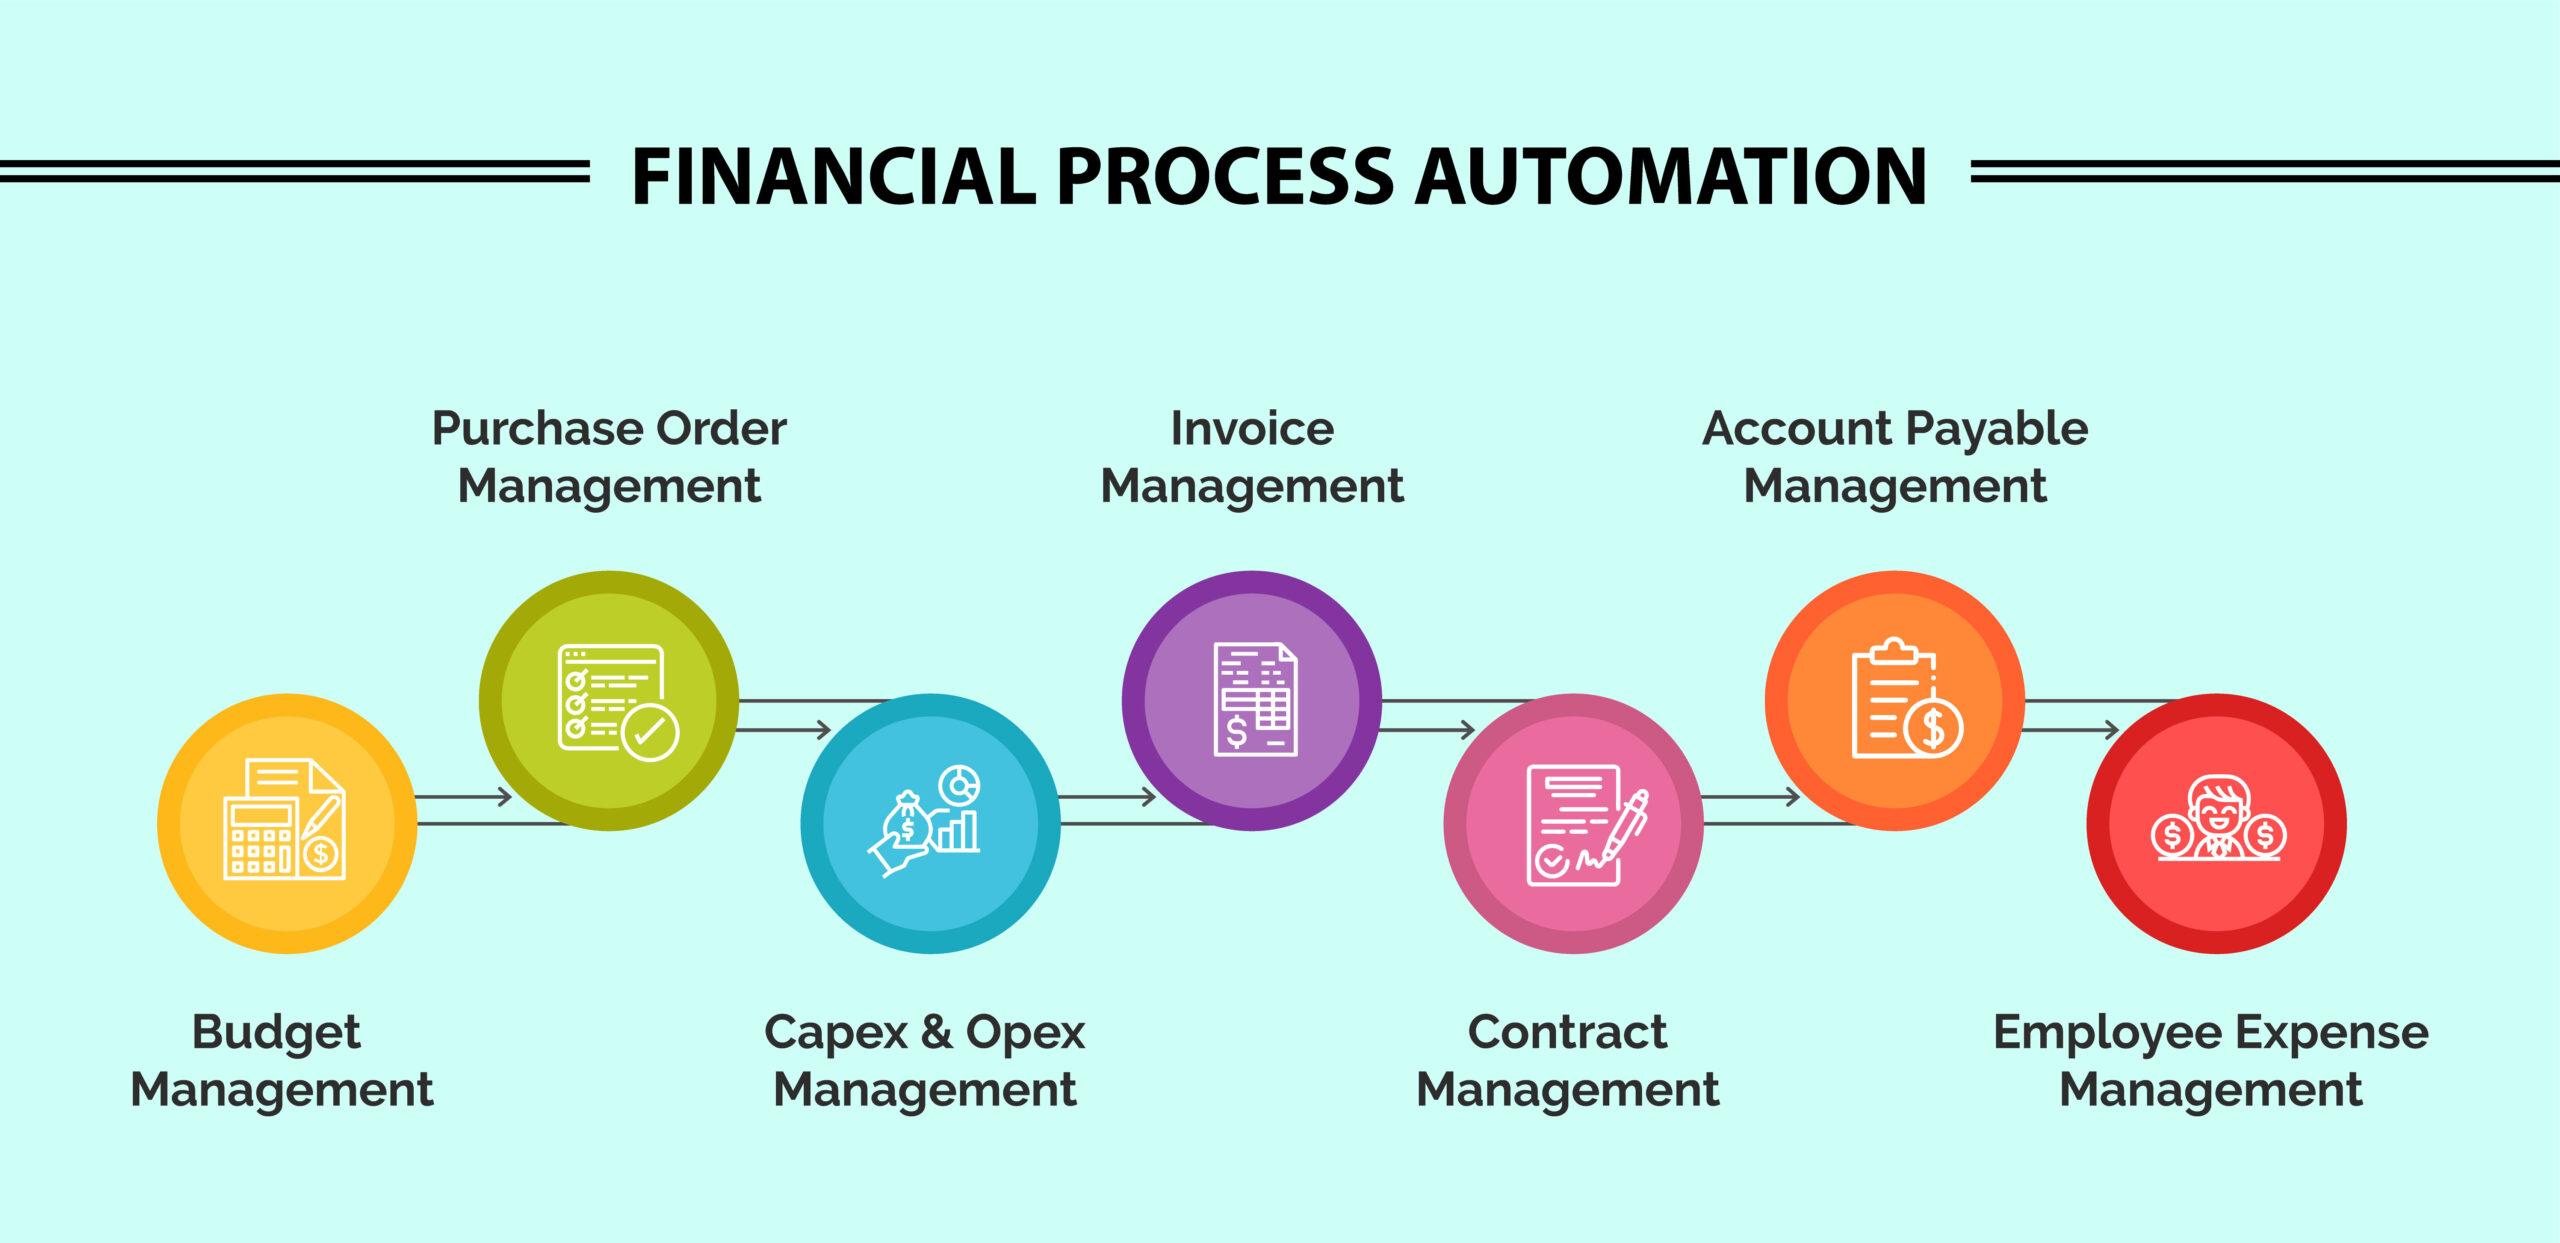 NetSuite Financial Process Automation